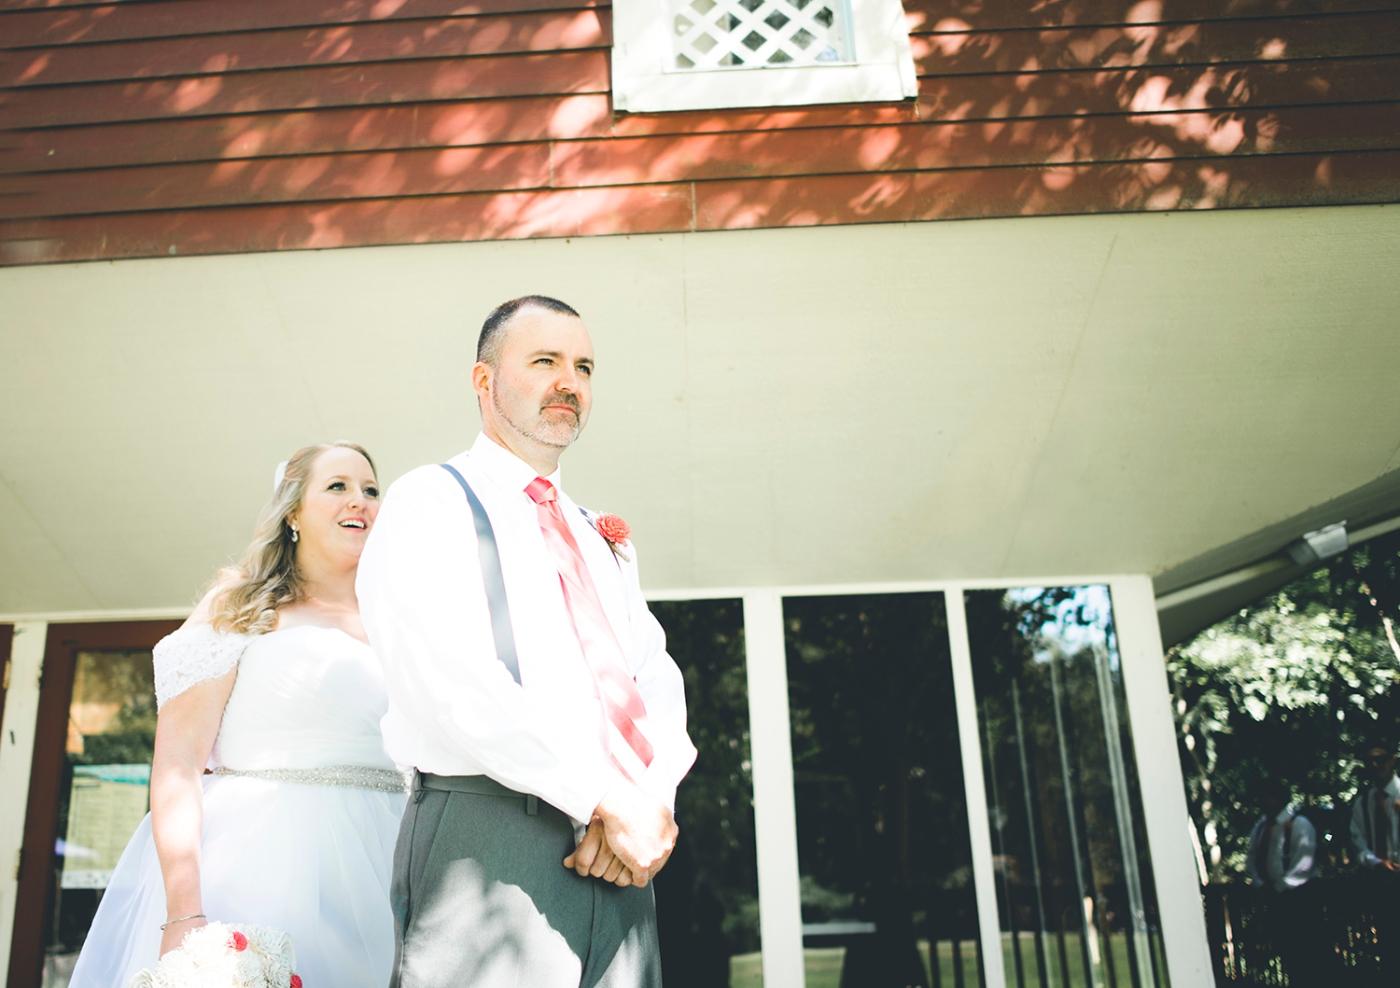 Jane_S_photography_Kadie_and_Steve_2016_Des_Moines_Marina_WeddingDSC_1511